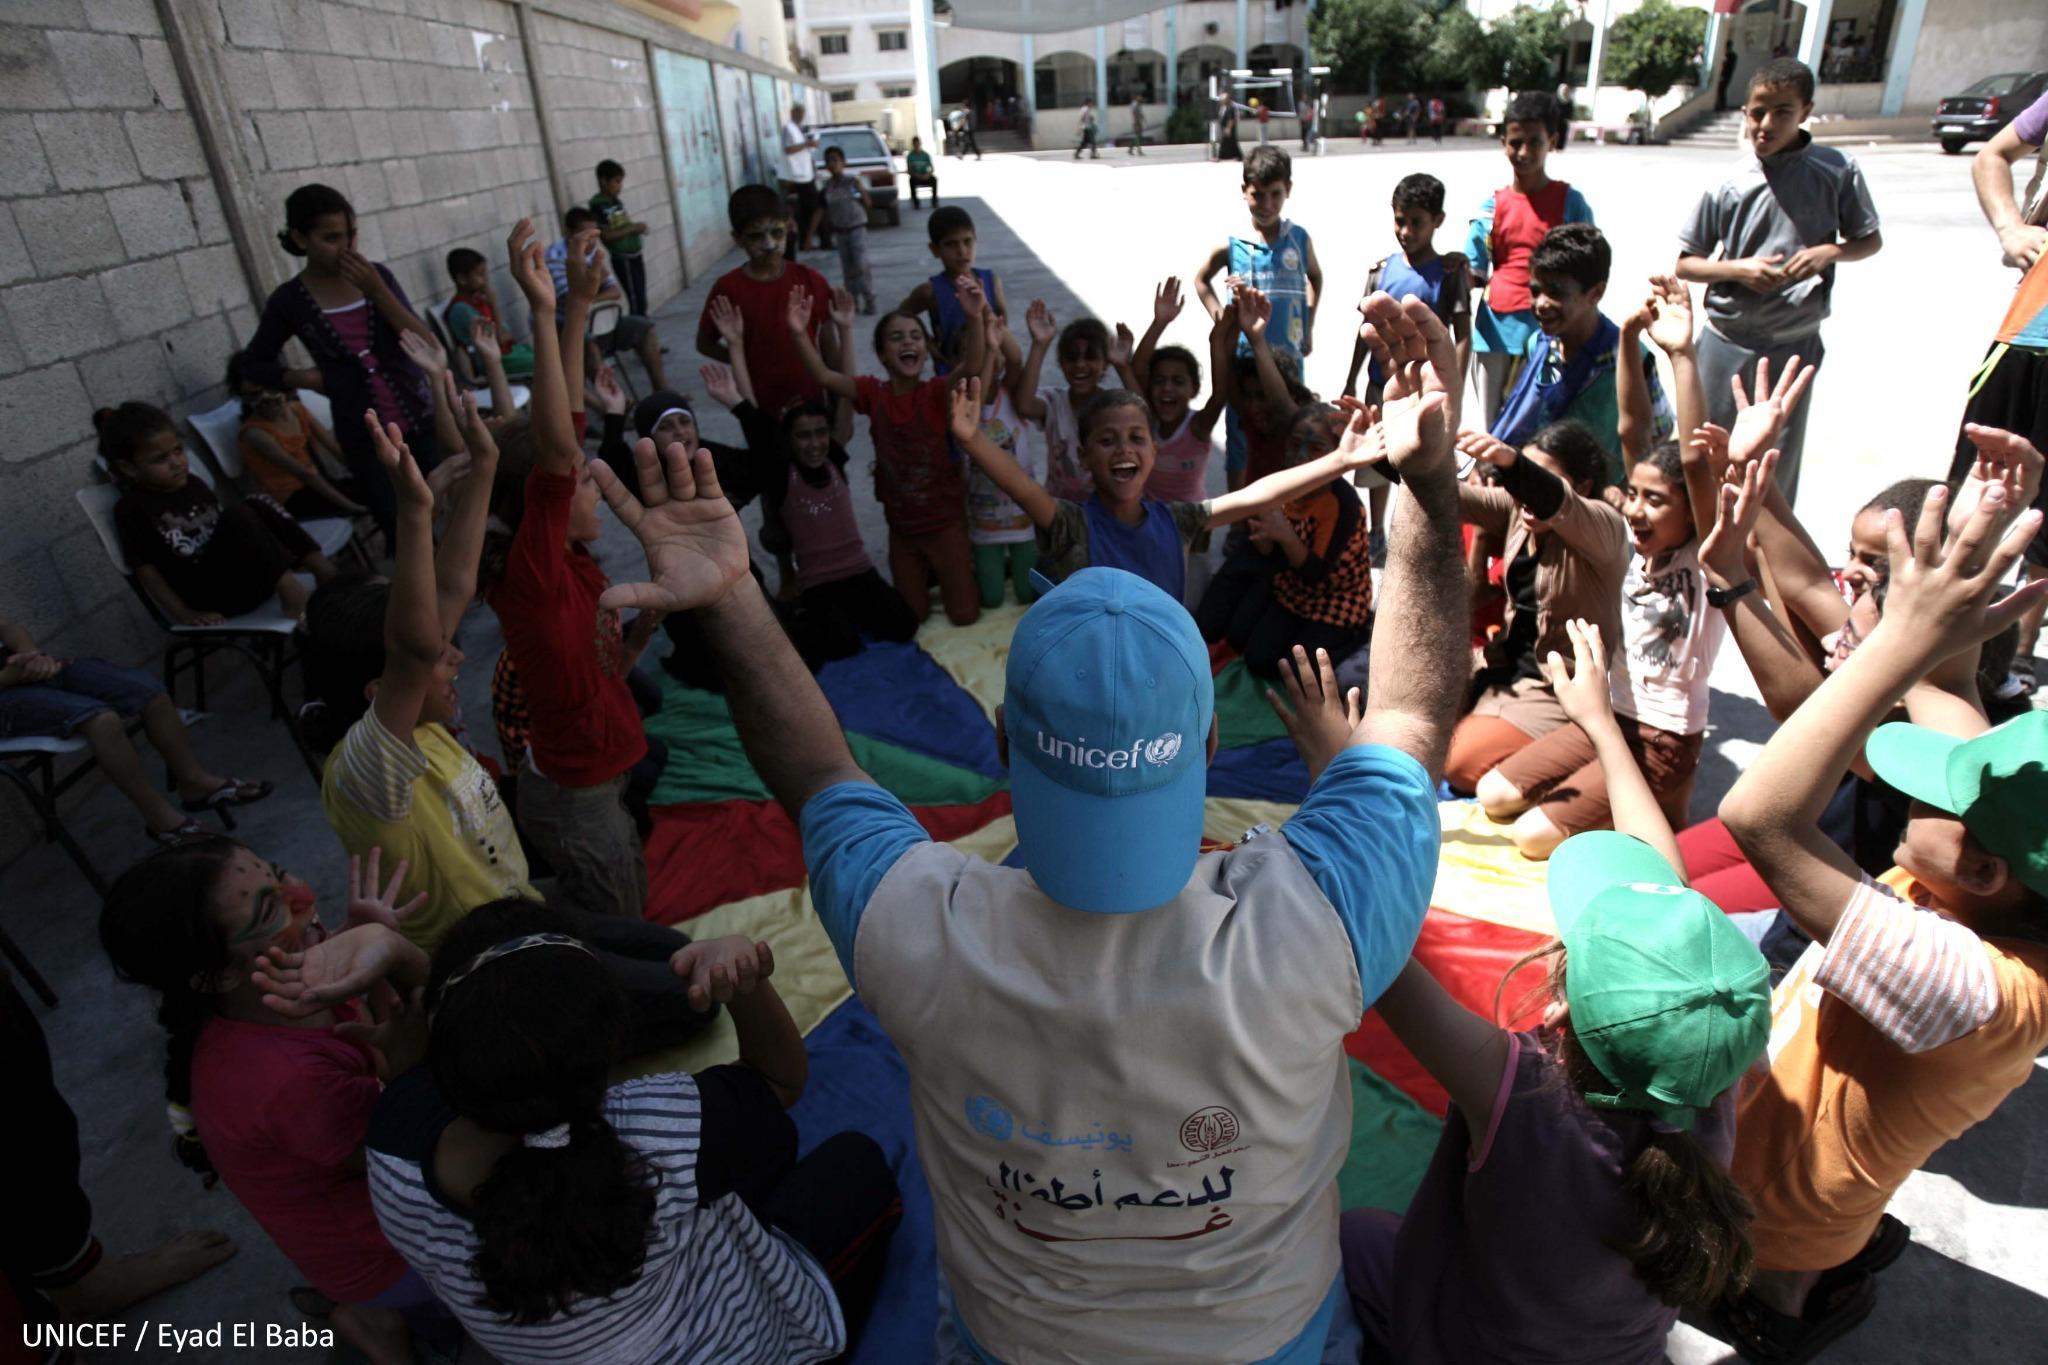 #Gaza: We're helping children cope with displacement through recreational activities. Via @UNICEFpalestine http://t.co/IInZnlhzBm